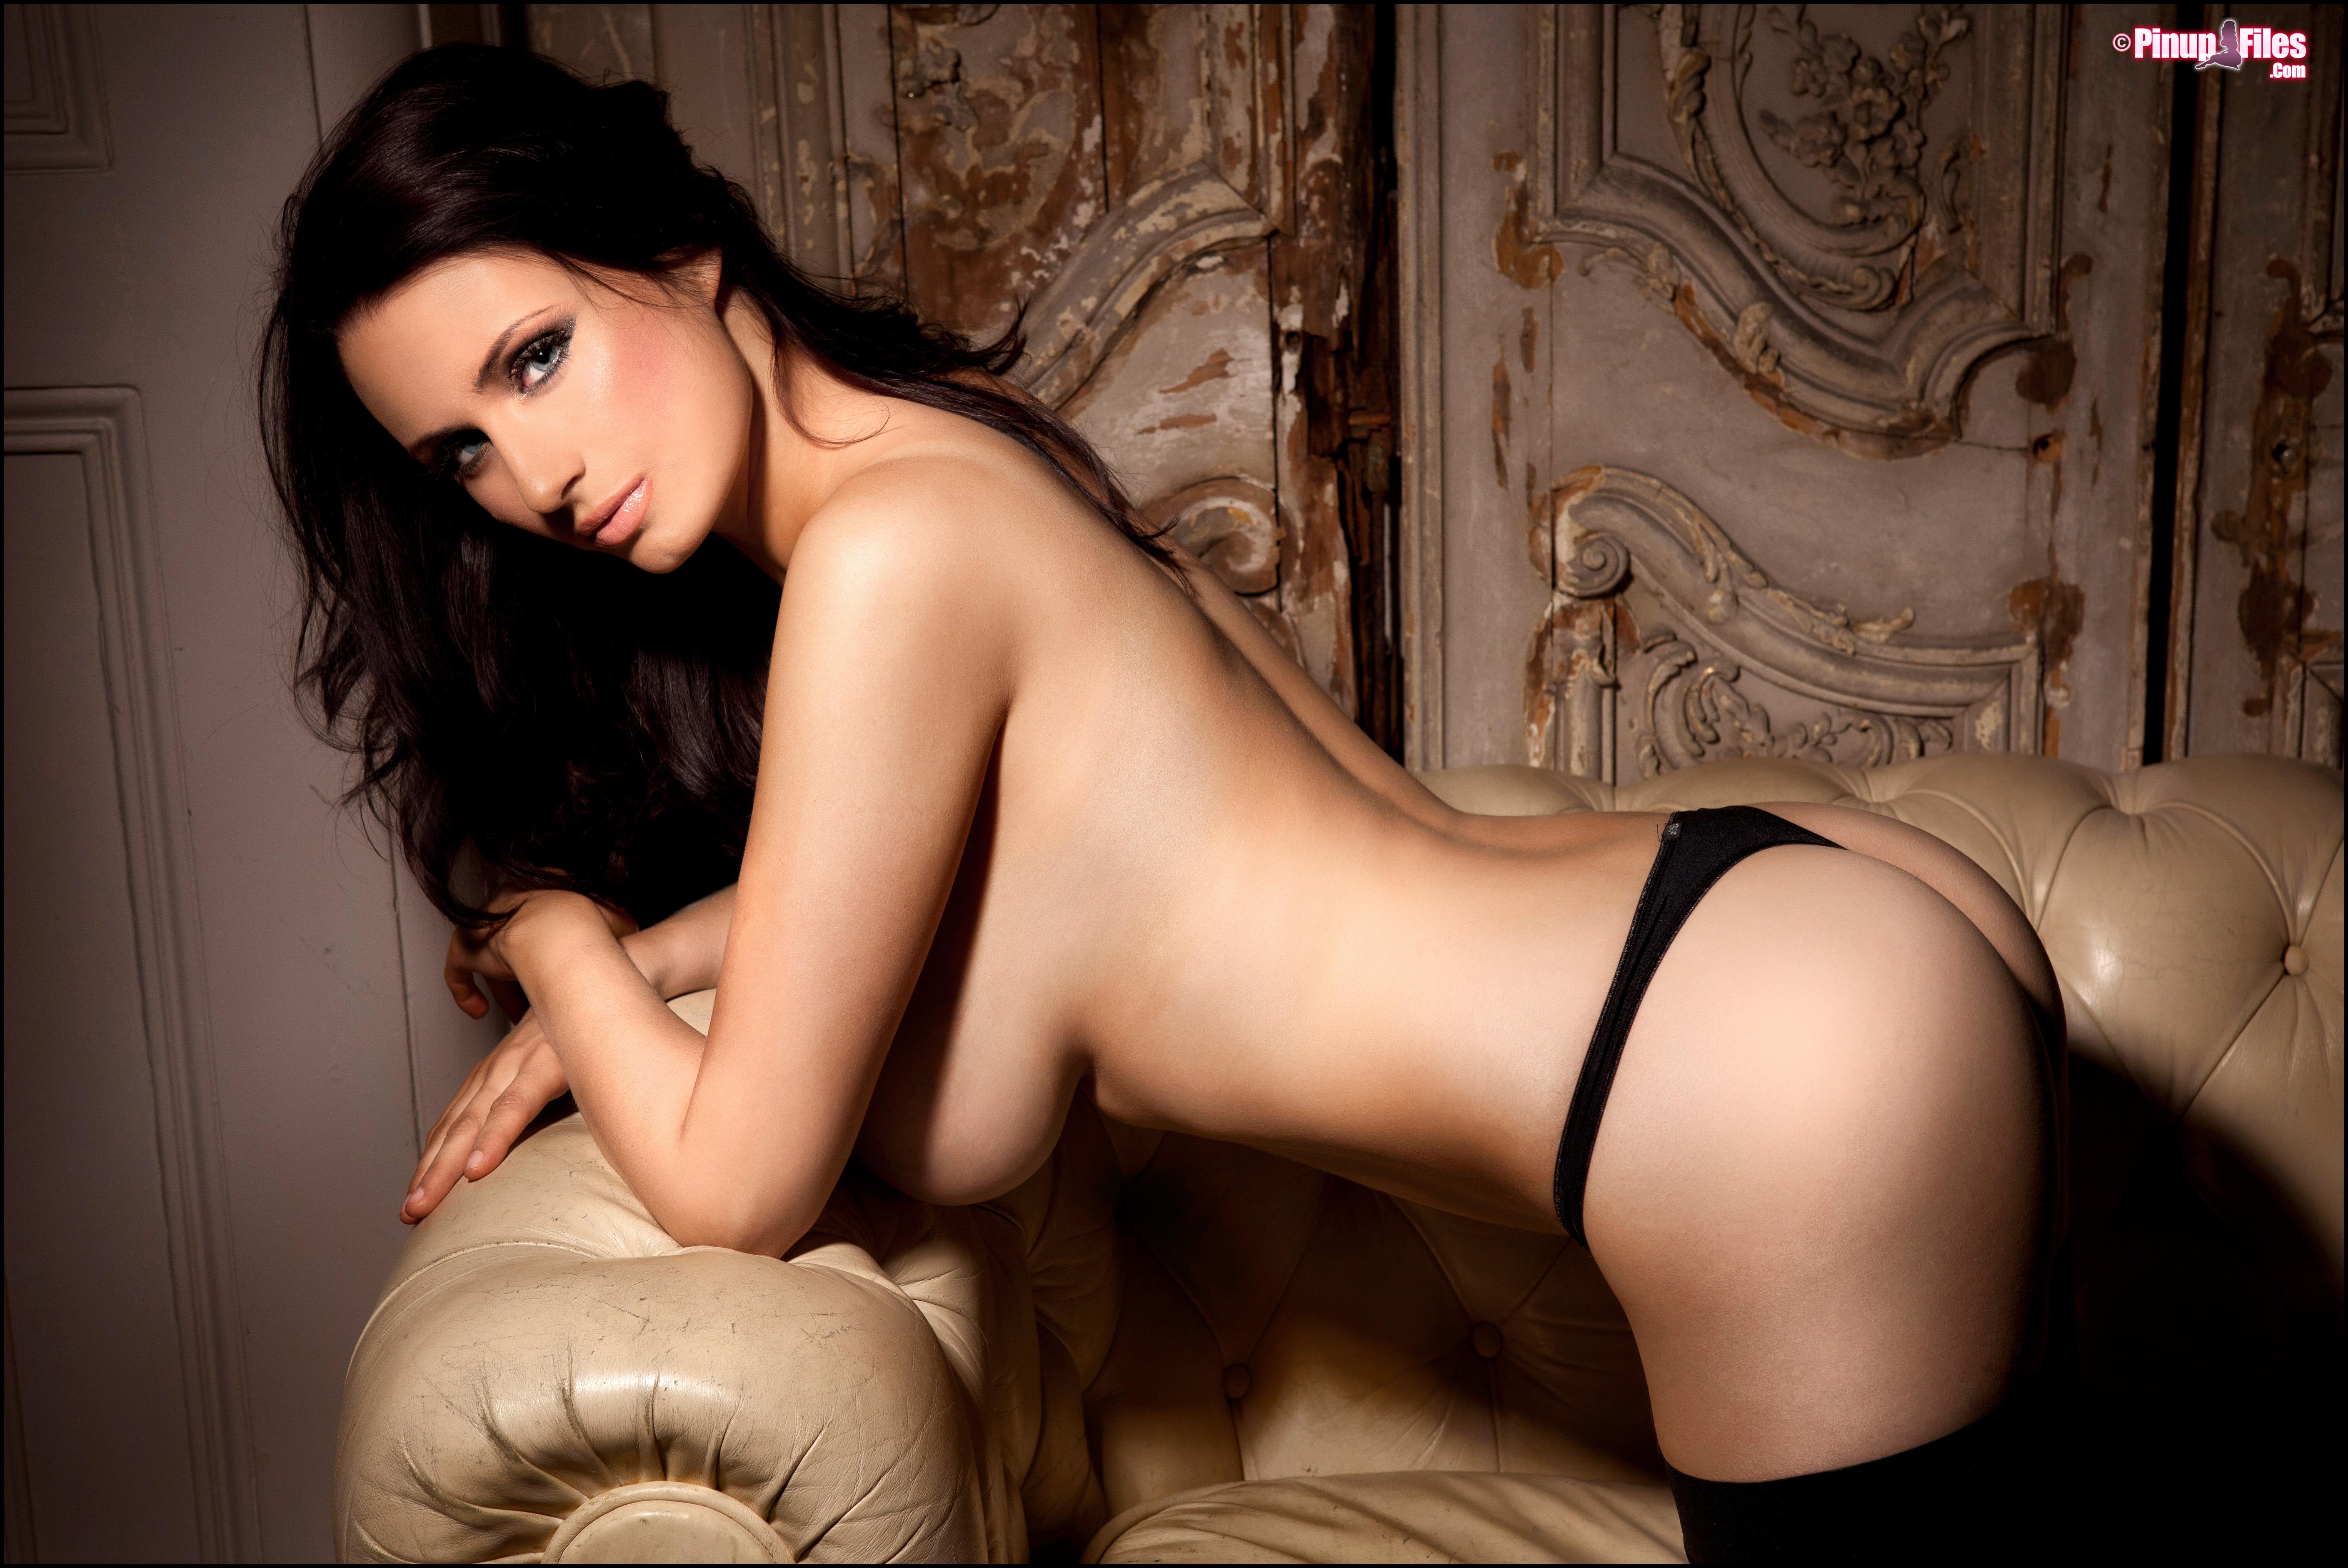 Alice goodwin039s phenomenal breasts 9